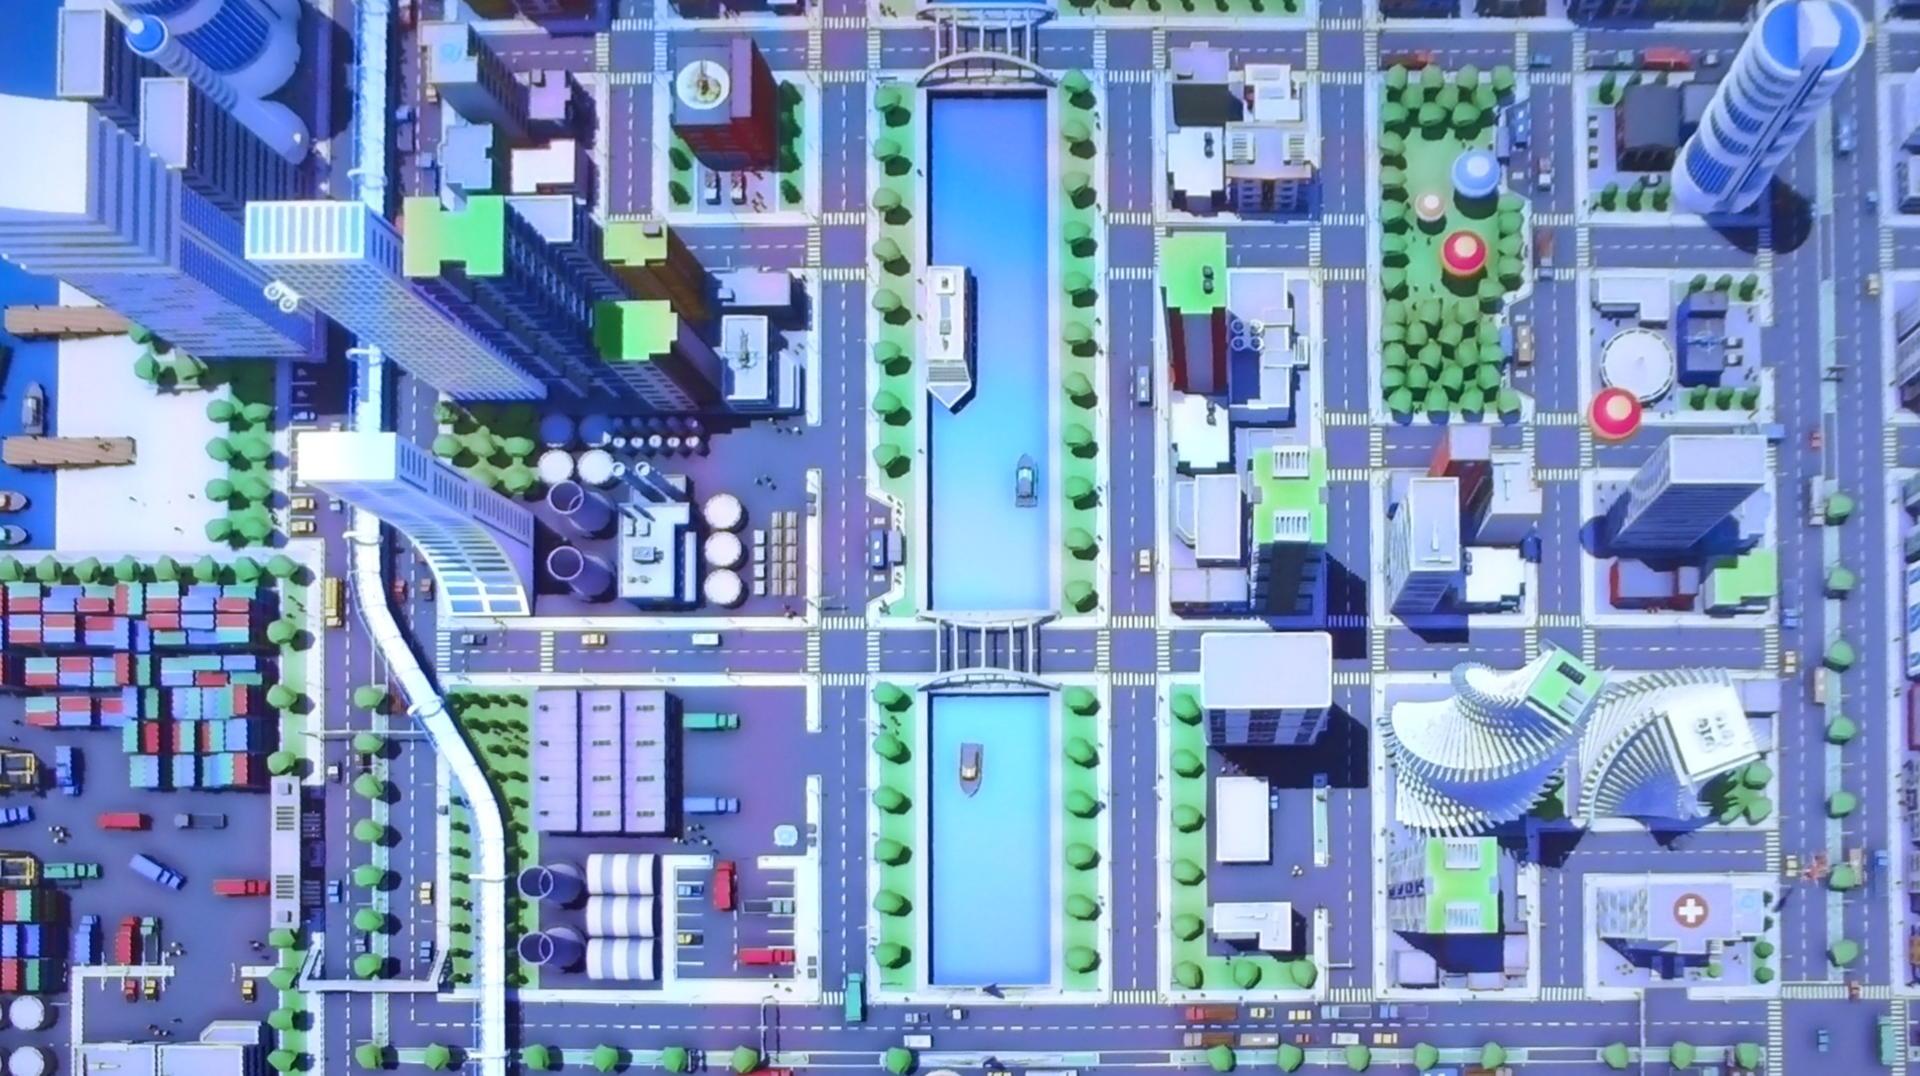 Stadt_der_Zukunft_pong_li_4